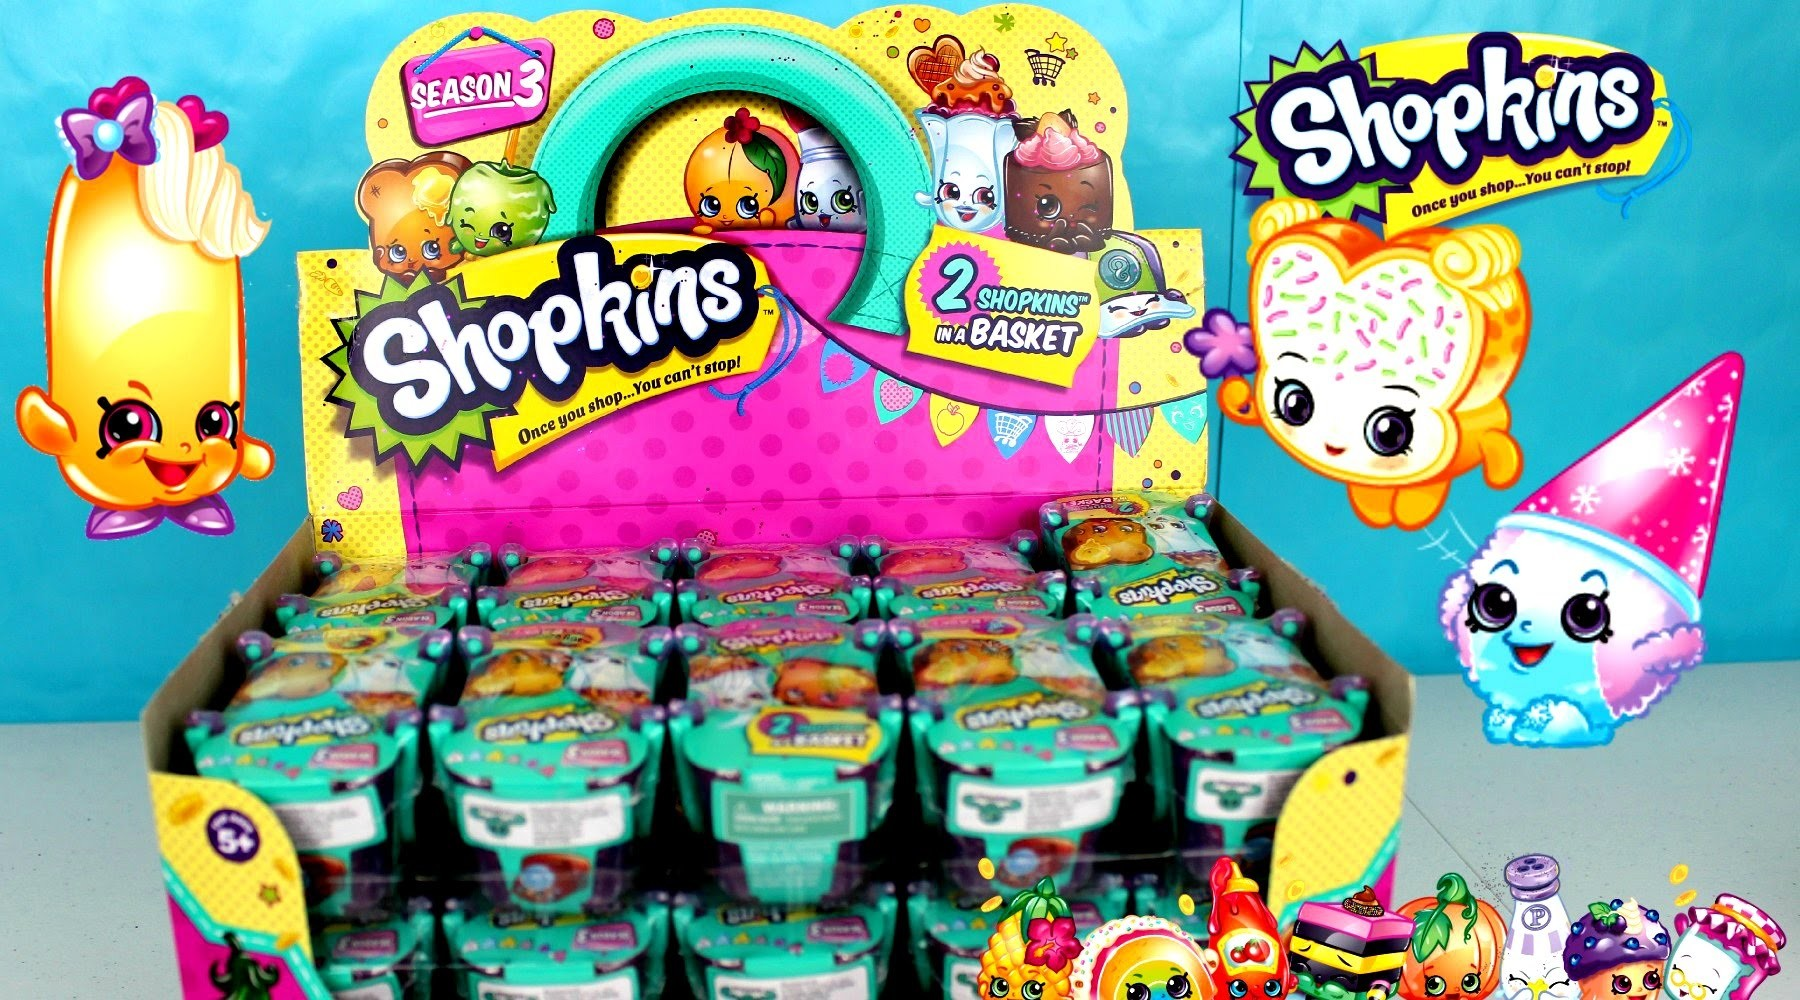 Shopkins Season 3 Juguetes Shopkins Español |Juguetes Sopresa